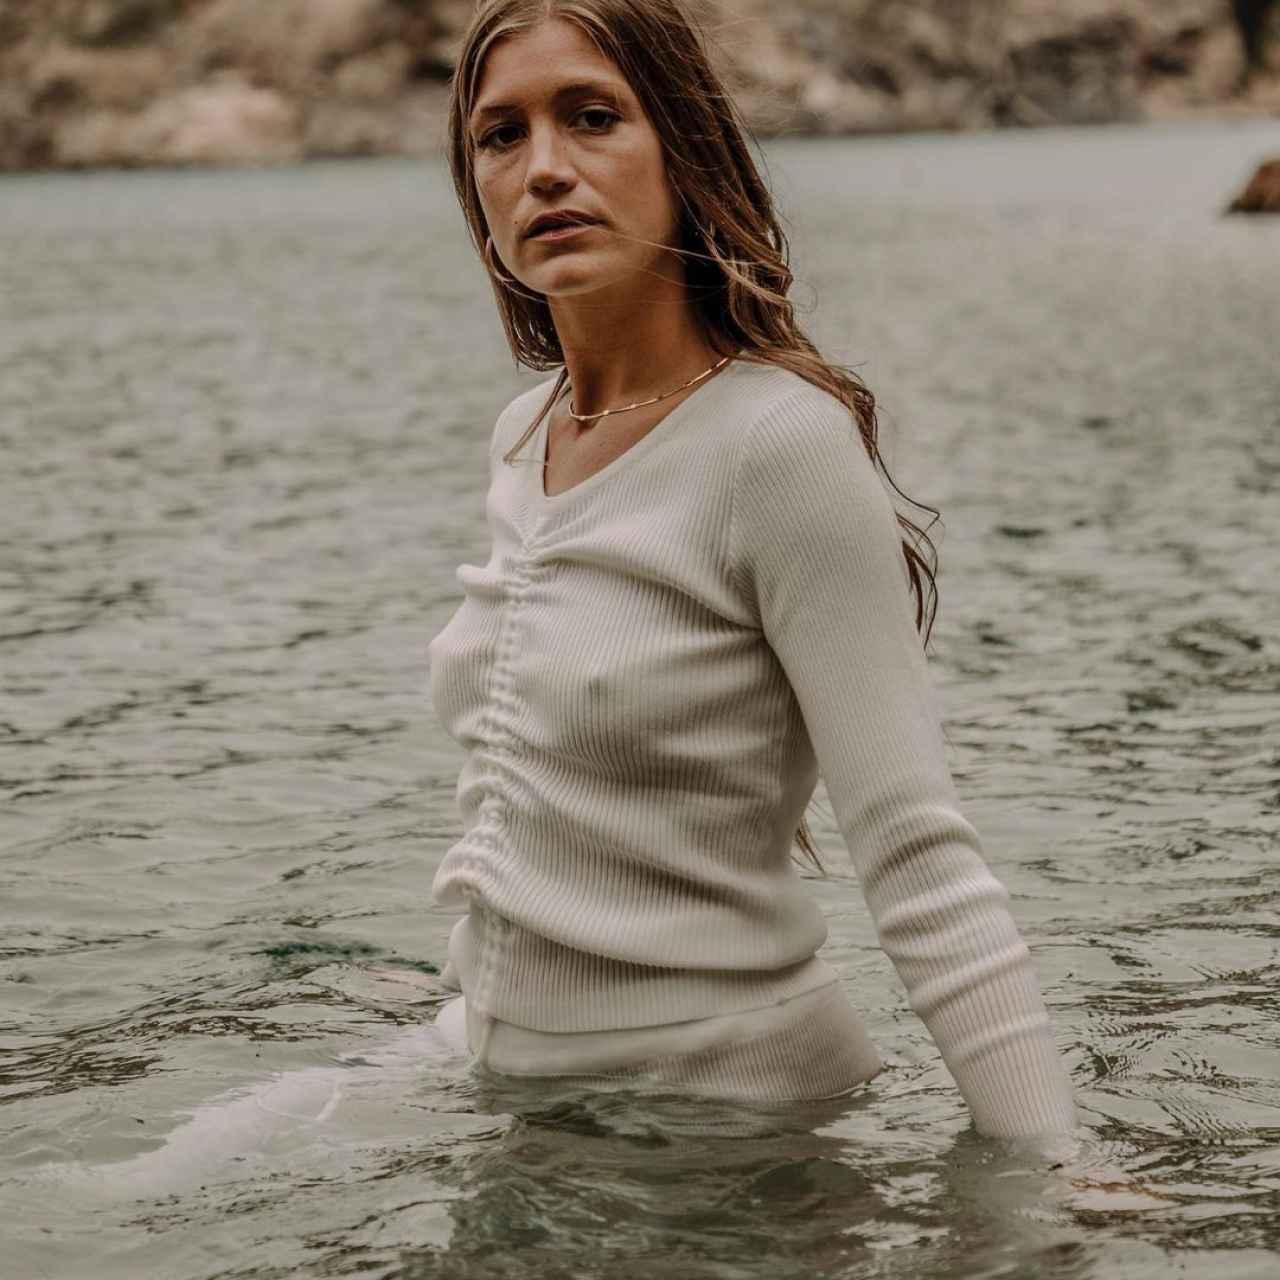 Miri ejerciendo de modelo para la marca Carola Monje.